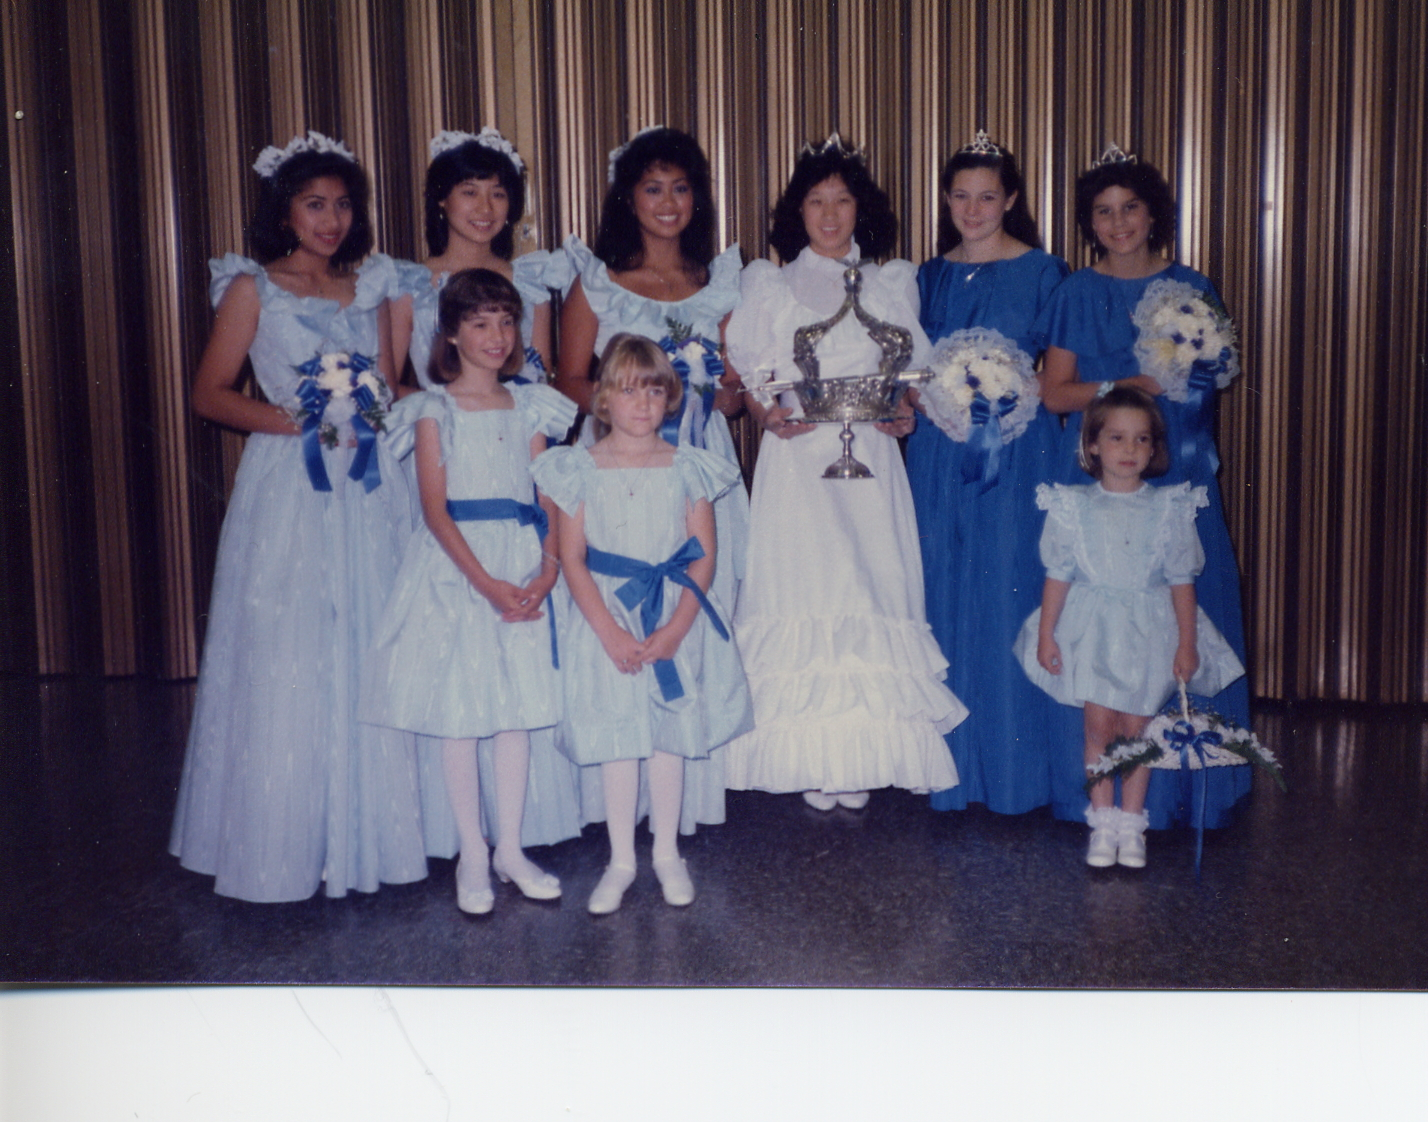 1985 Festival Queen -  Lisa Yee    Sidemaids - Tricia Boyle & Cynthia Gutierrez Valencia